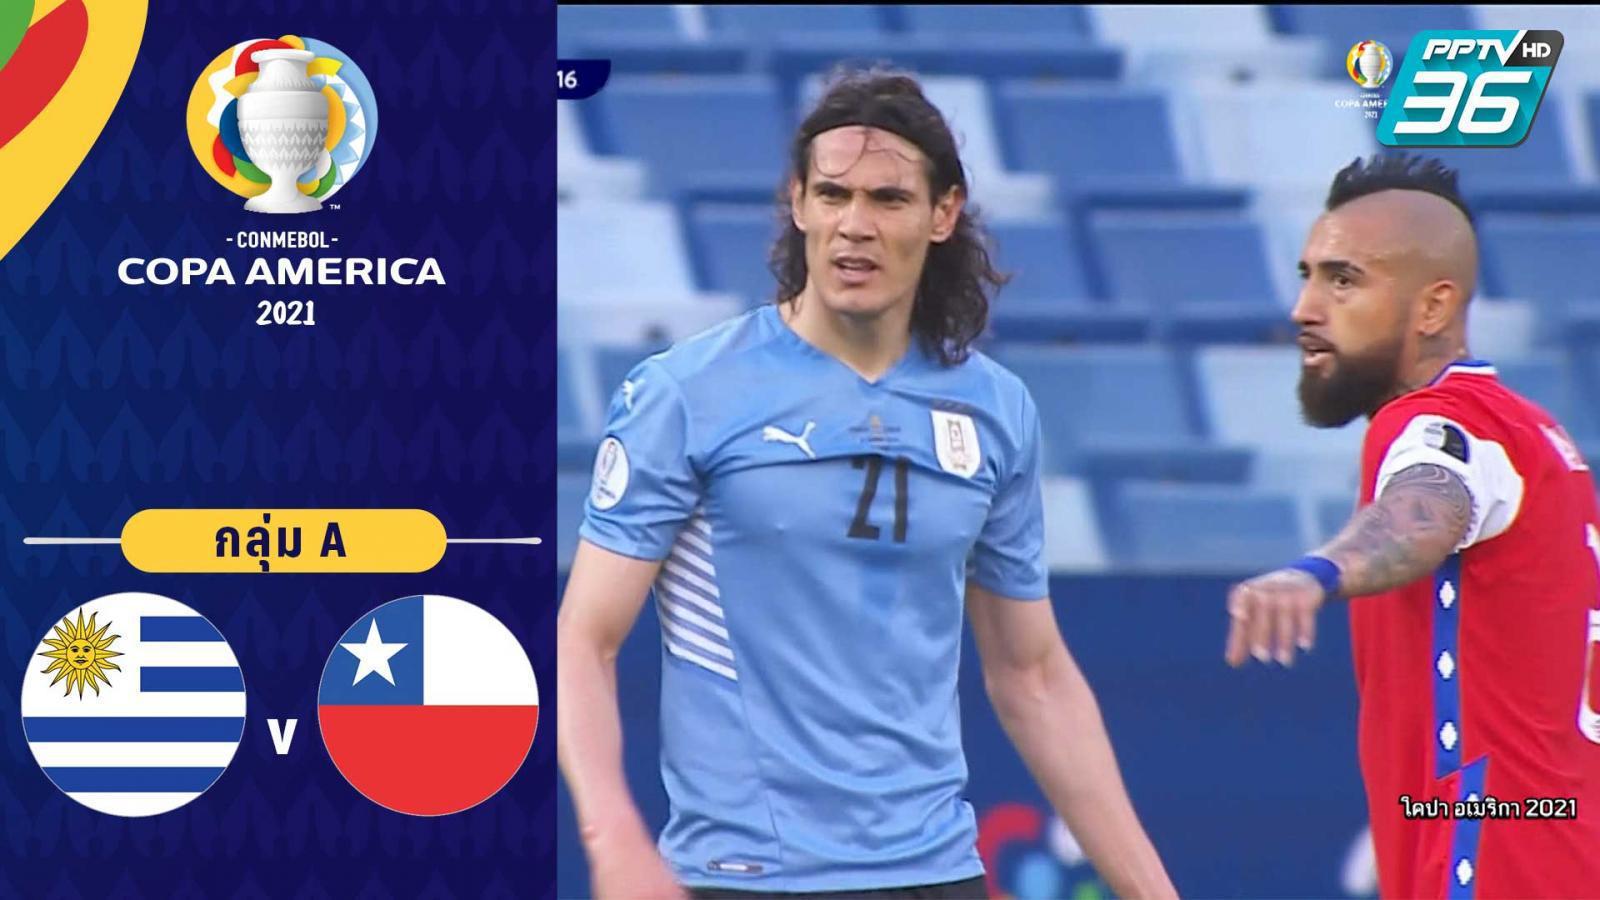 Full Match โคปา อเมริกา 2021 | อุรุกวัย 1-1 ชิลี | 22 มิ.ย. 64